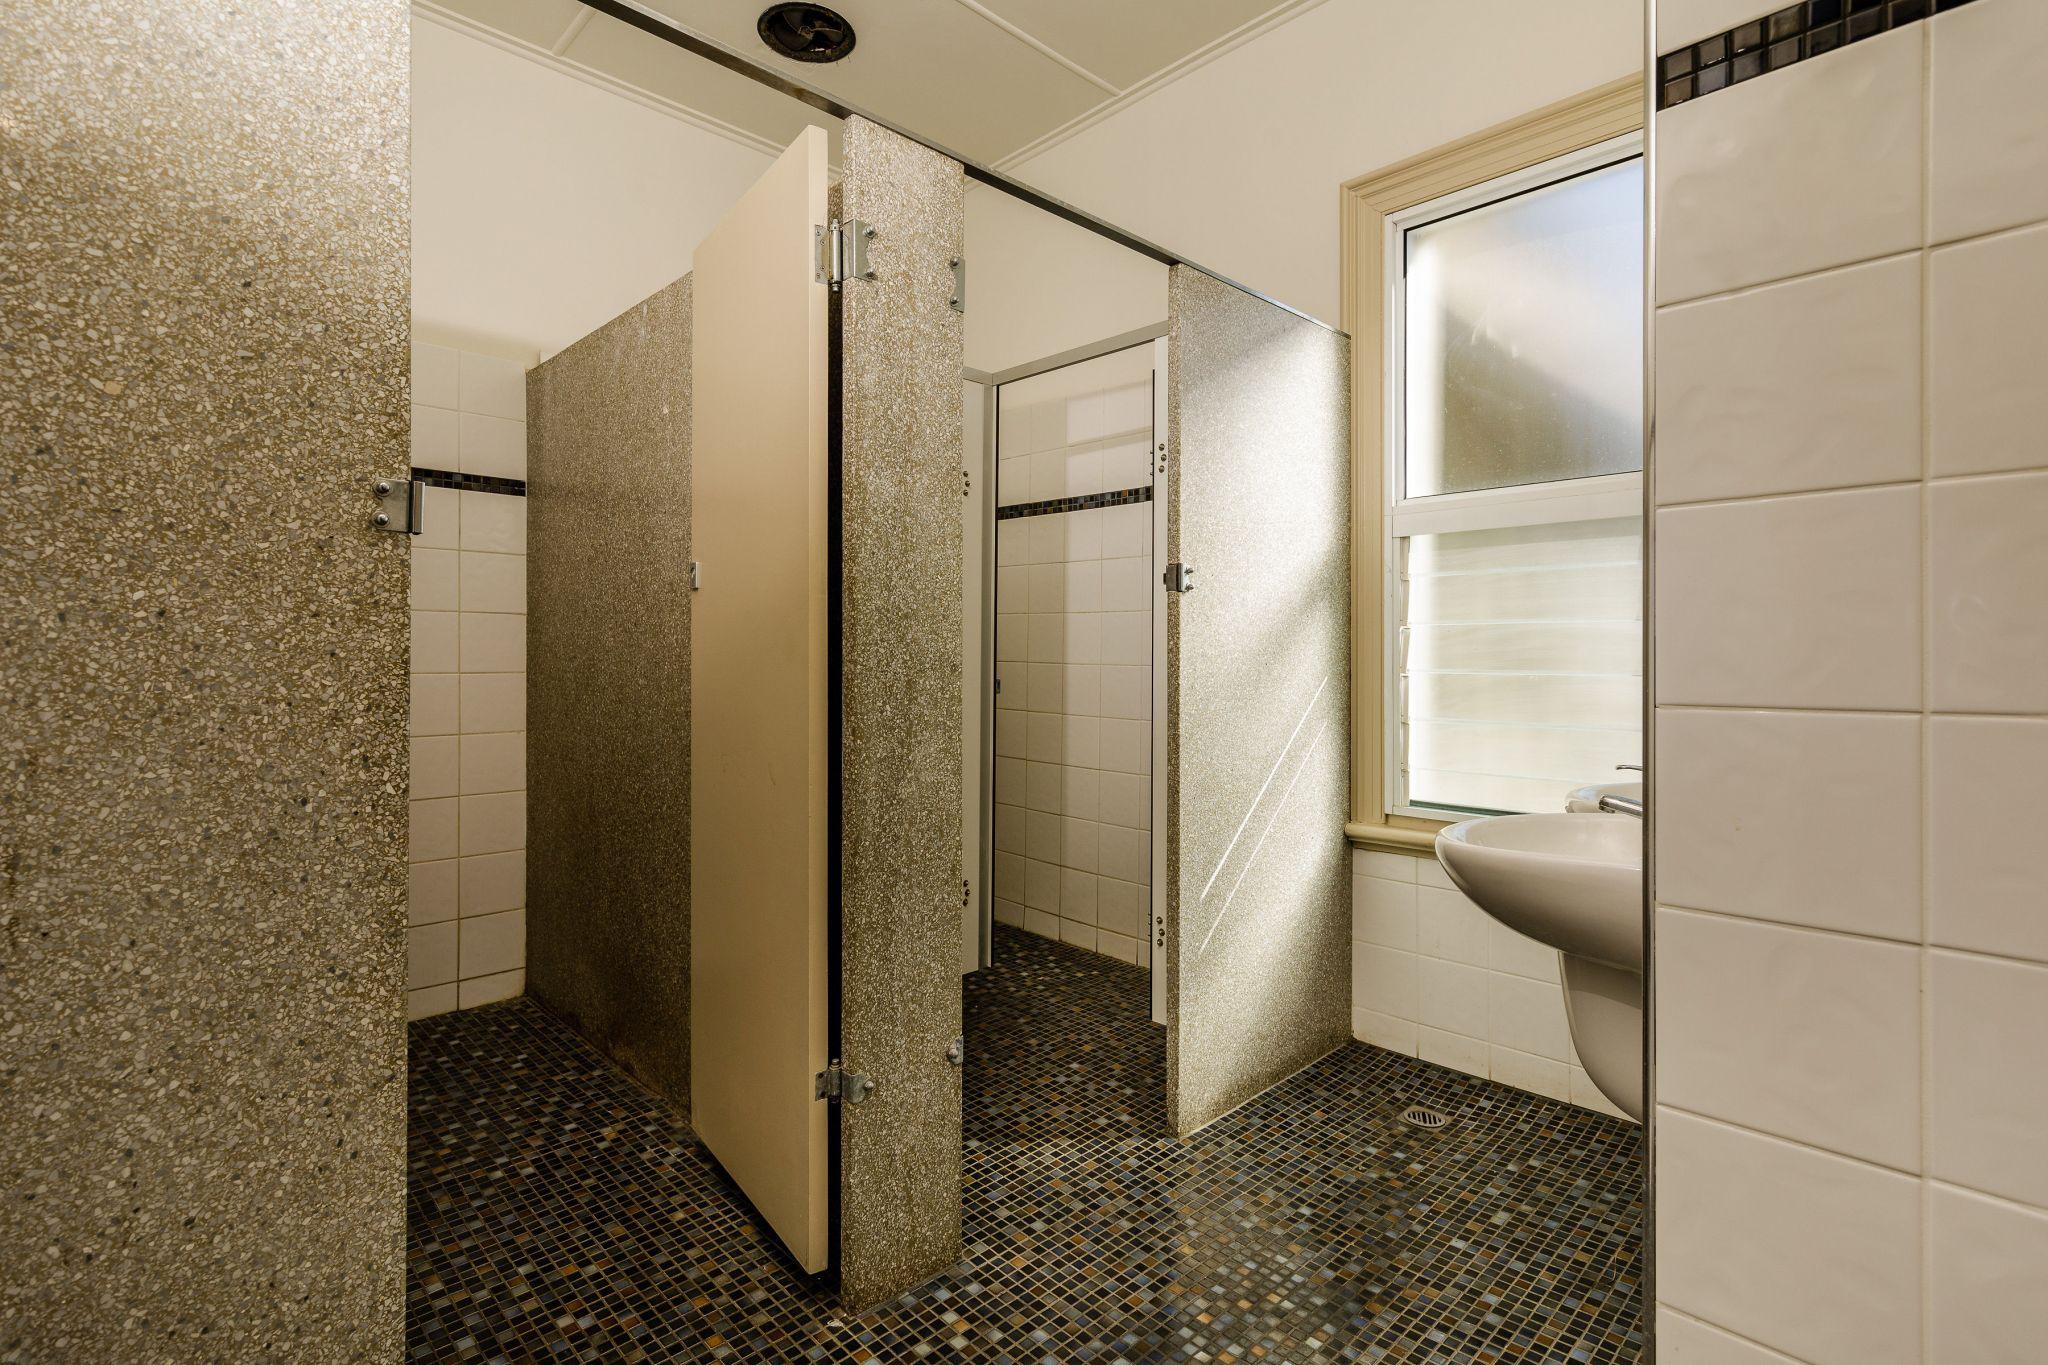 Waterloo Bay Hotel - Pub Accommodation - Toilets